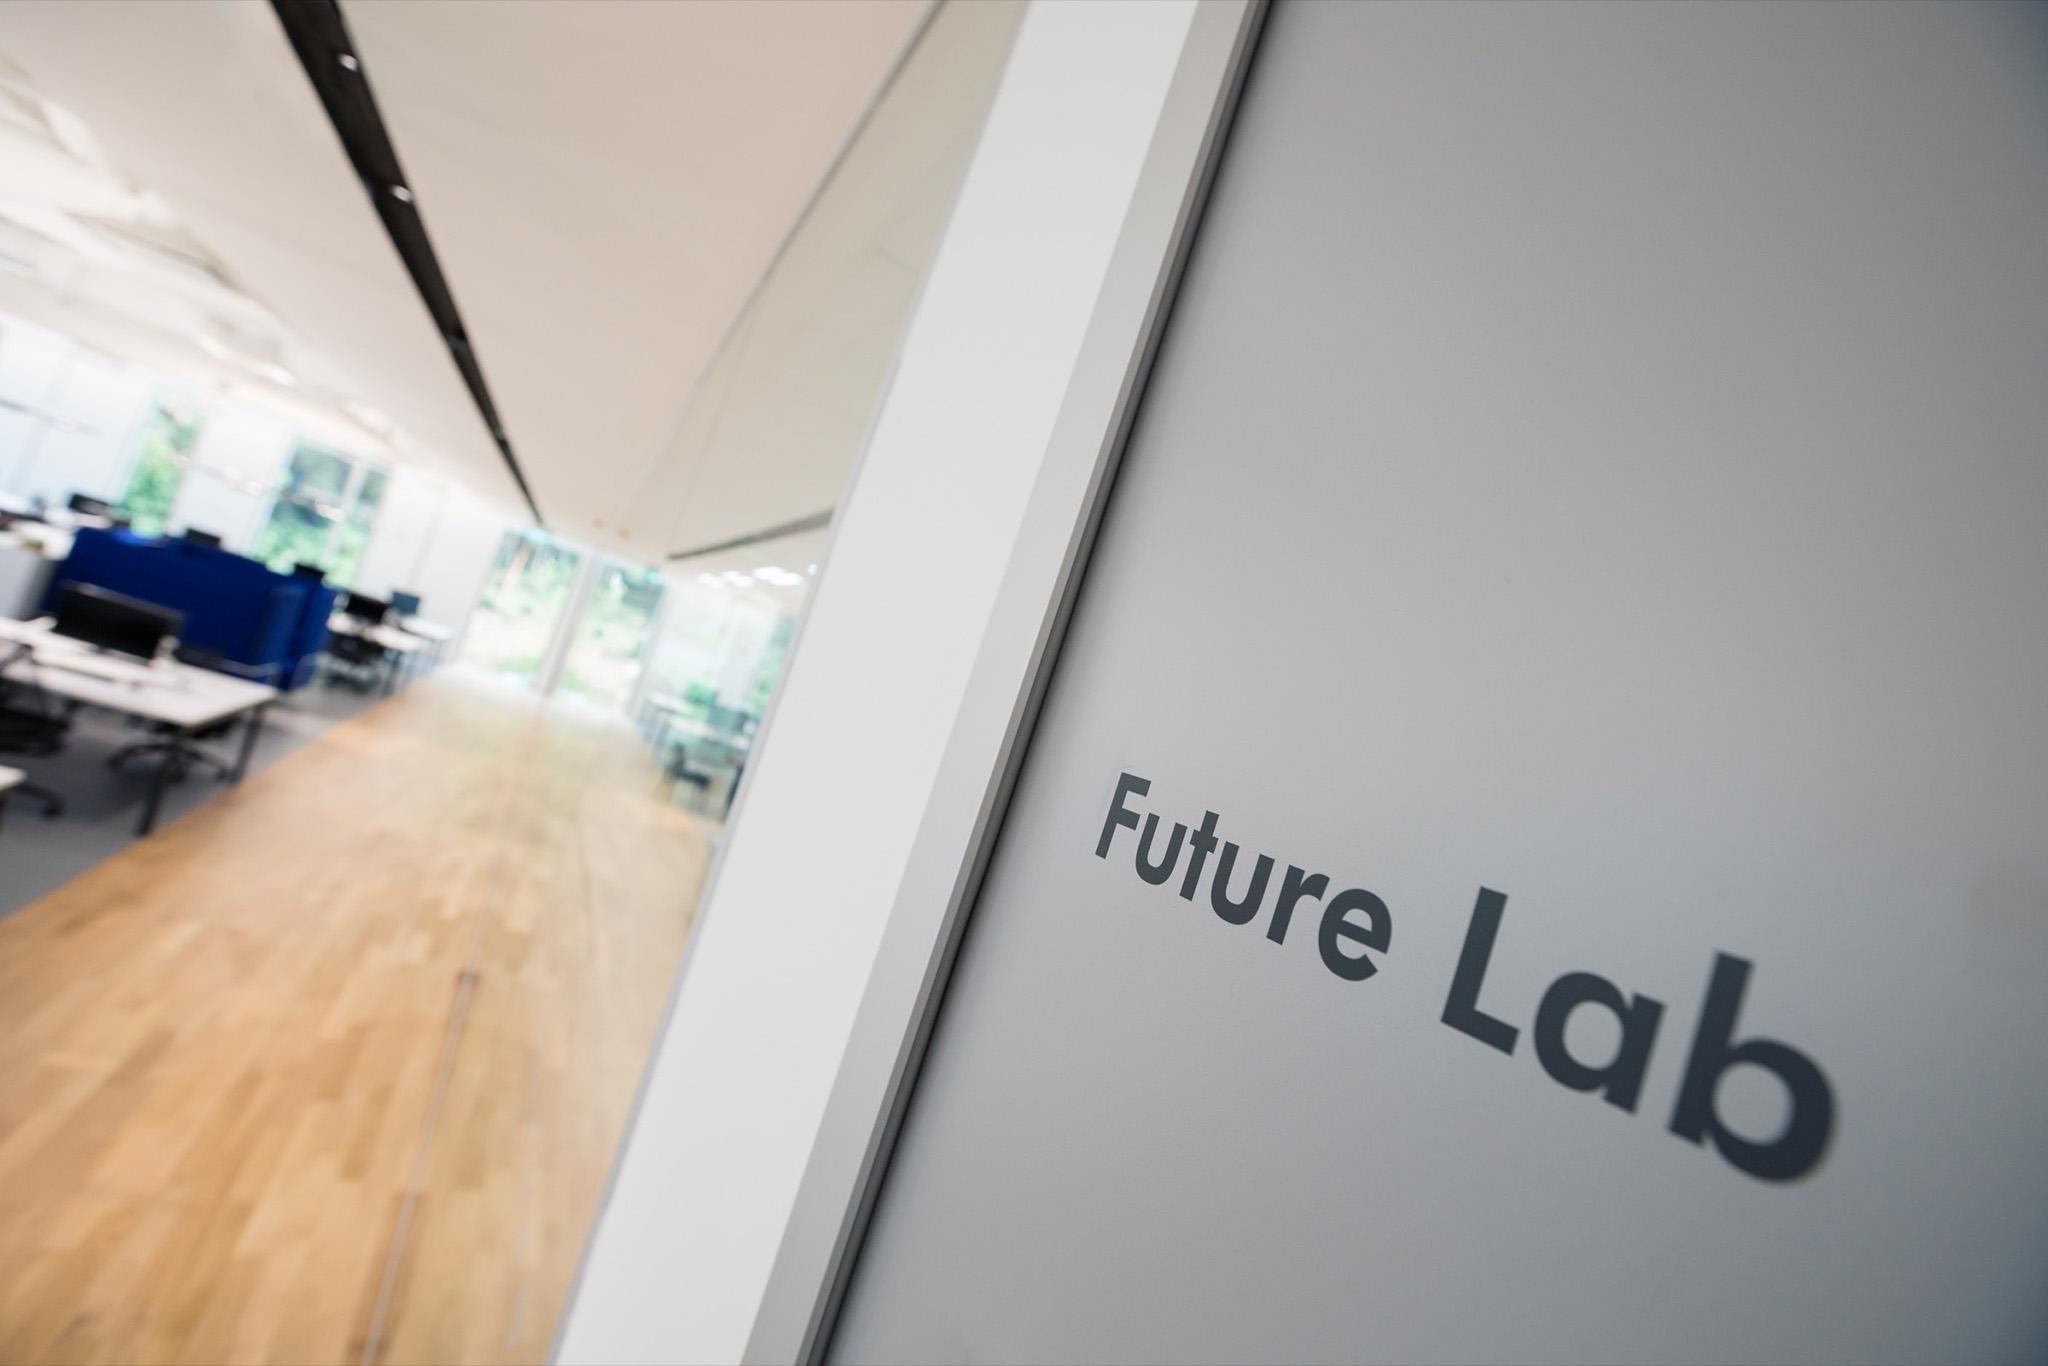 dyson-stc-future-lab.jpg